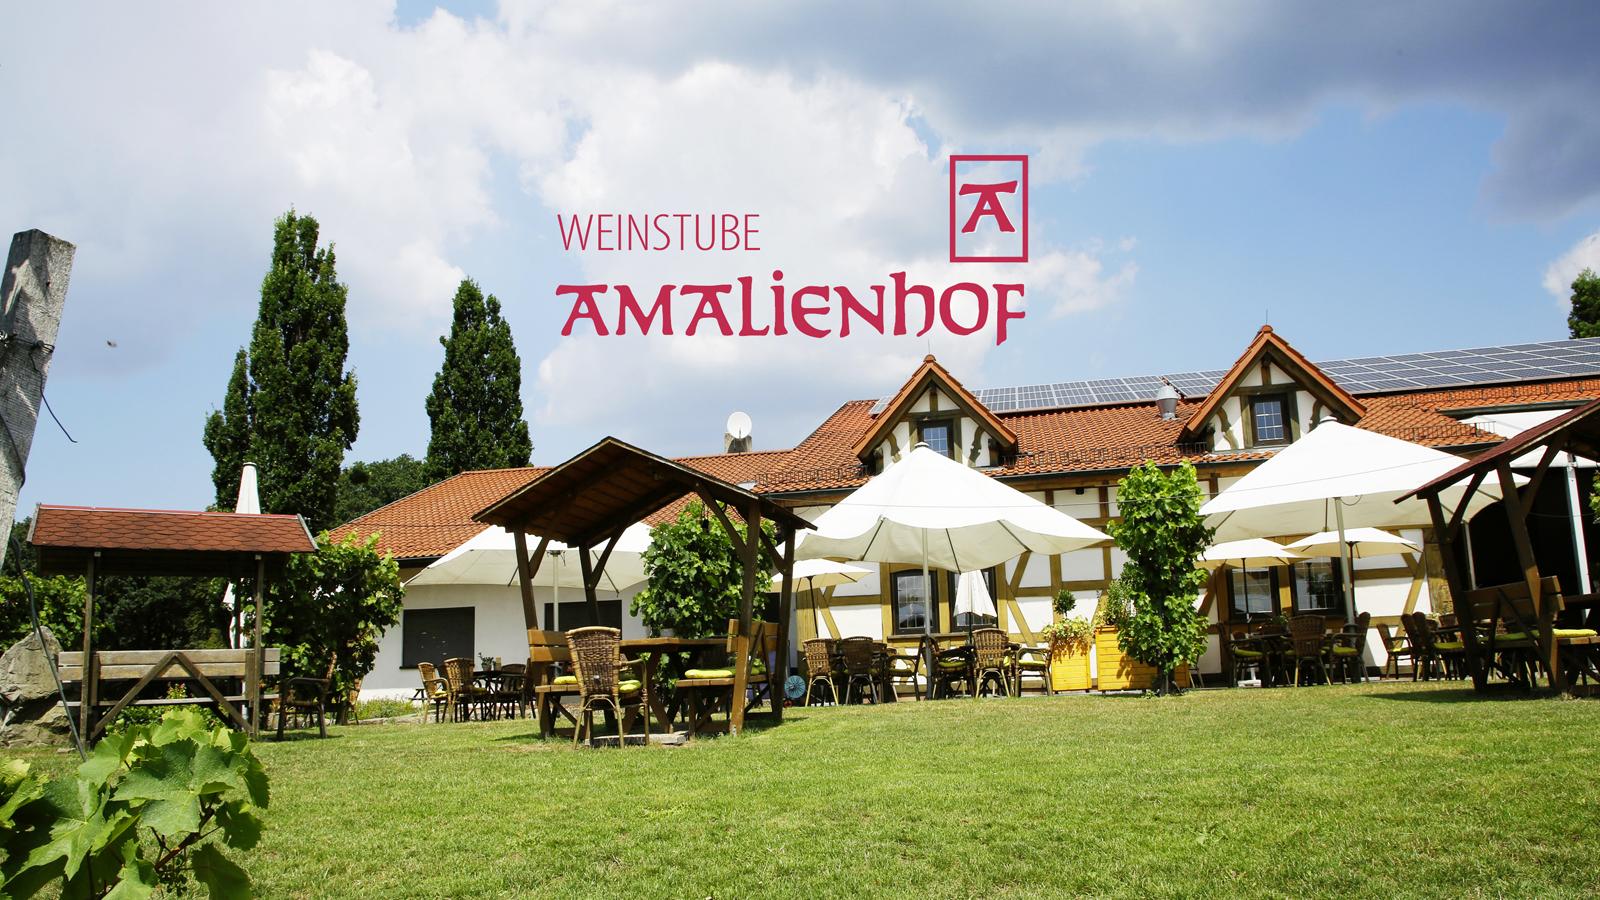 Bild 1 Weinstube Amalienhof